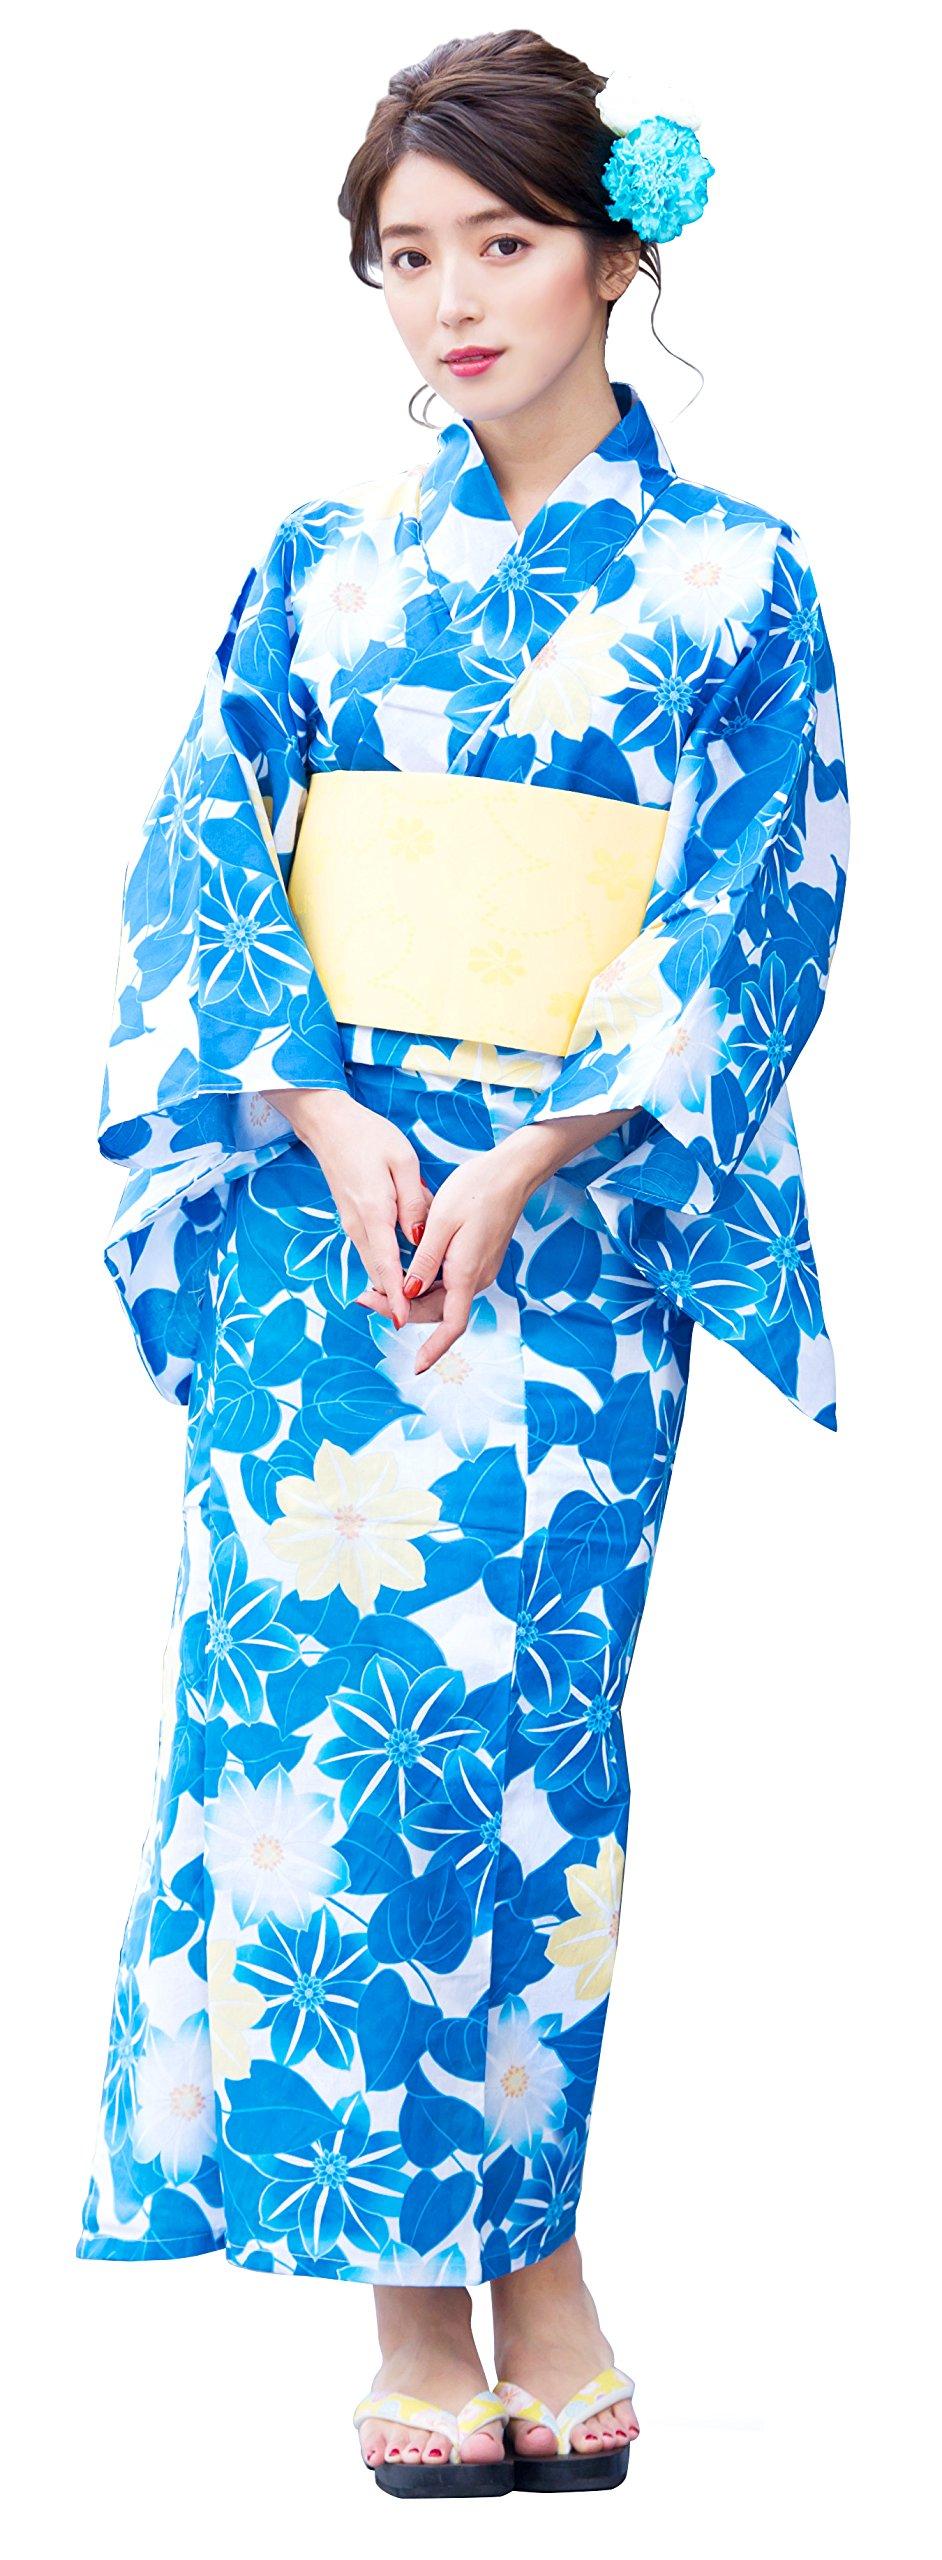 Kimura Jitsugyo Women's Kyoto Traditional Easy Wearing Kawaii Yukata Robe(Japanese Casual Kimono) Full Set 4 Blue & Clematis Type 5 Woman